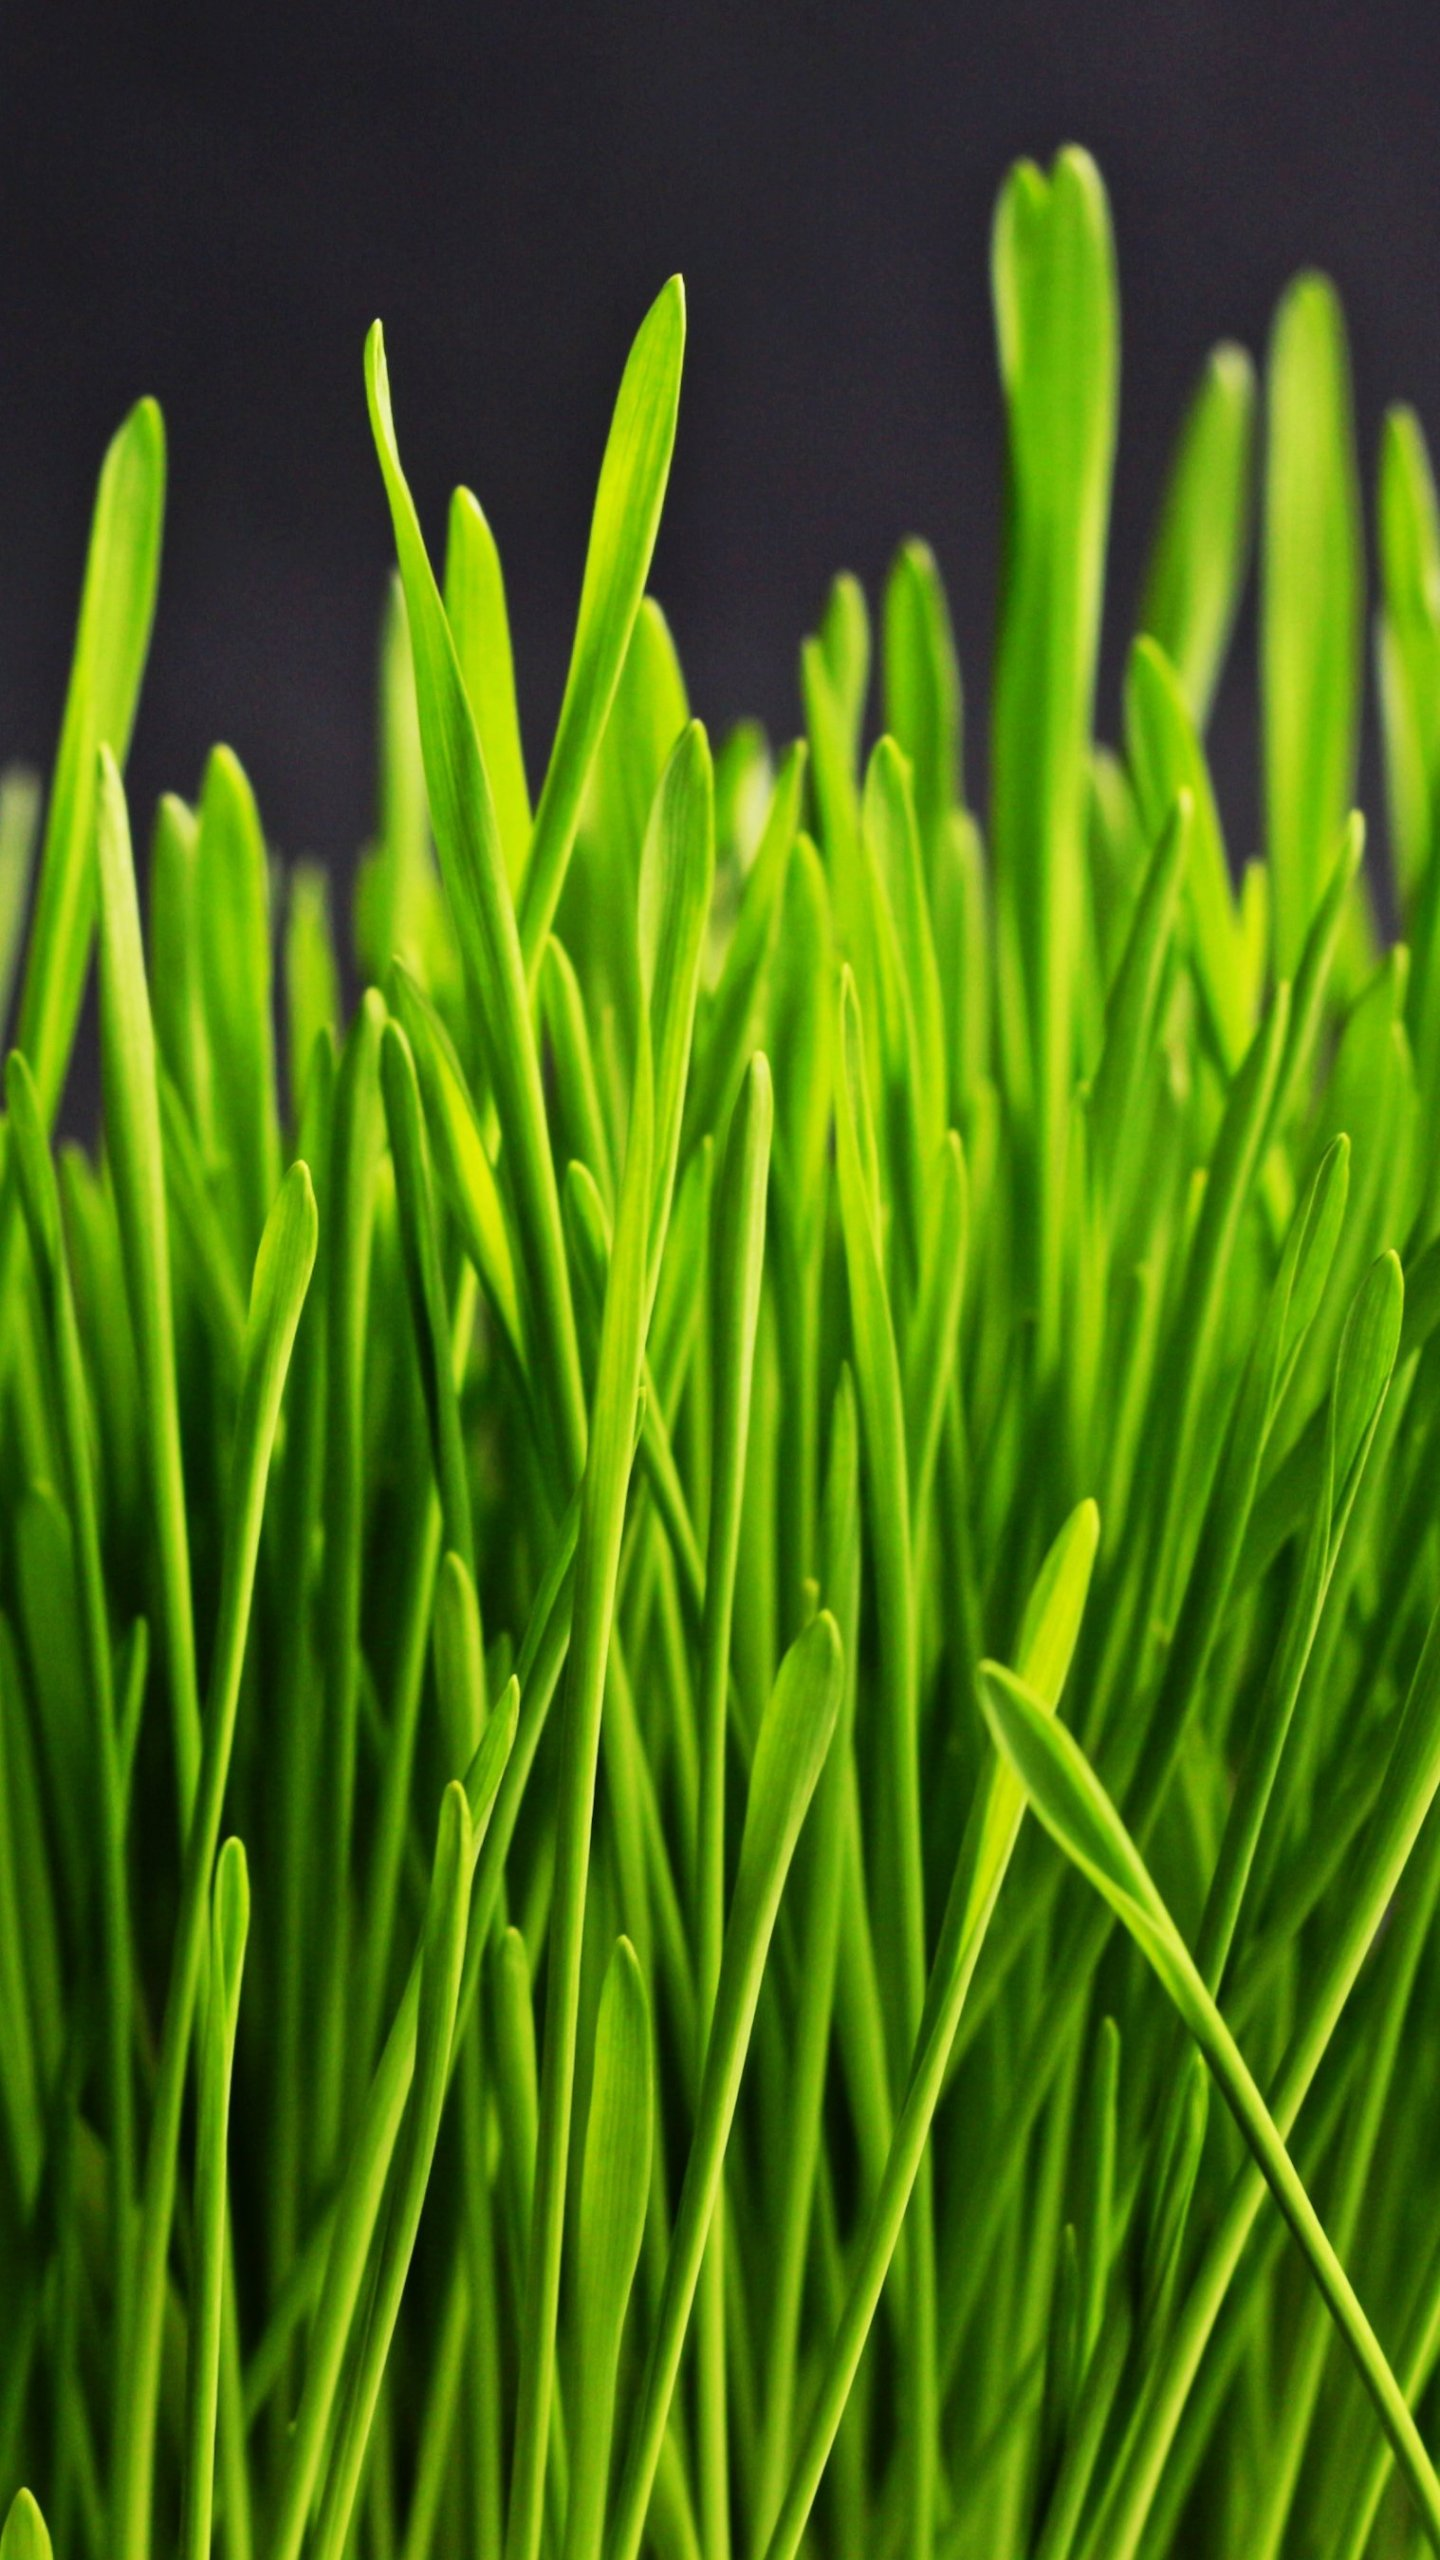 Green Grass Wallpaper Iphone Android Desktop Backgrounds